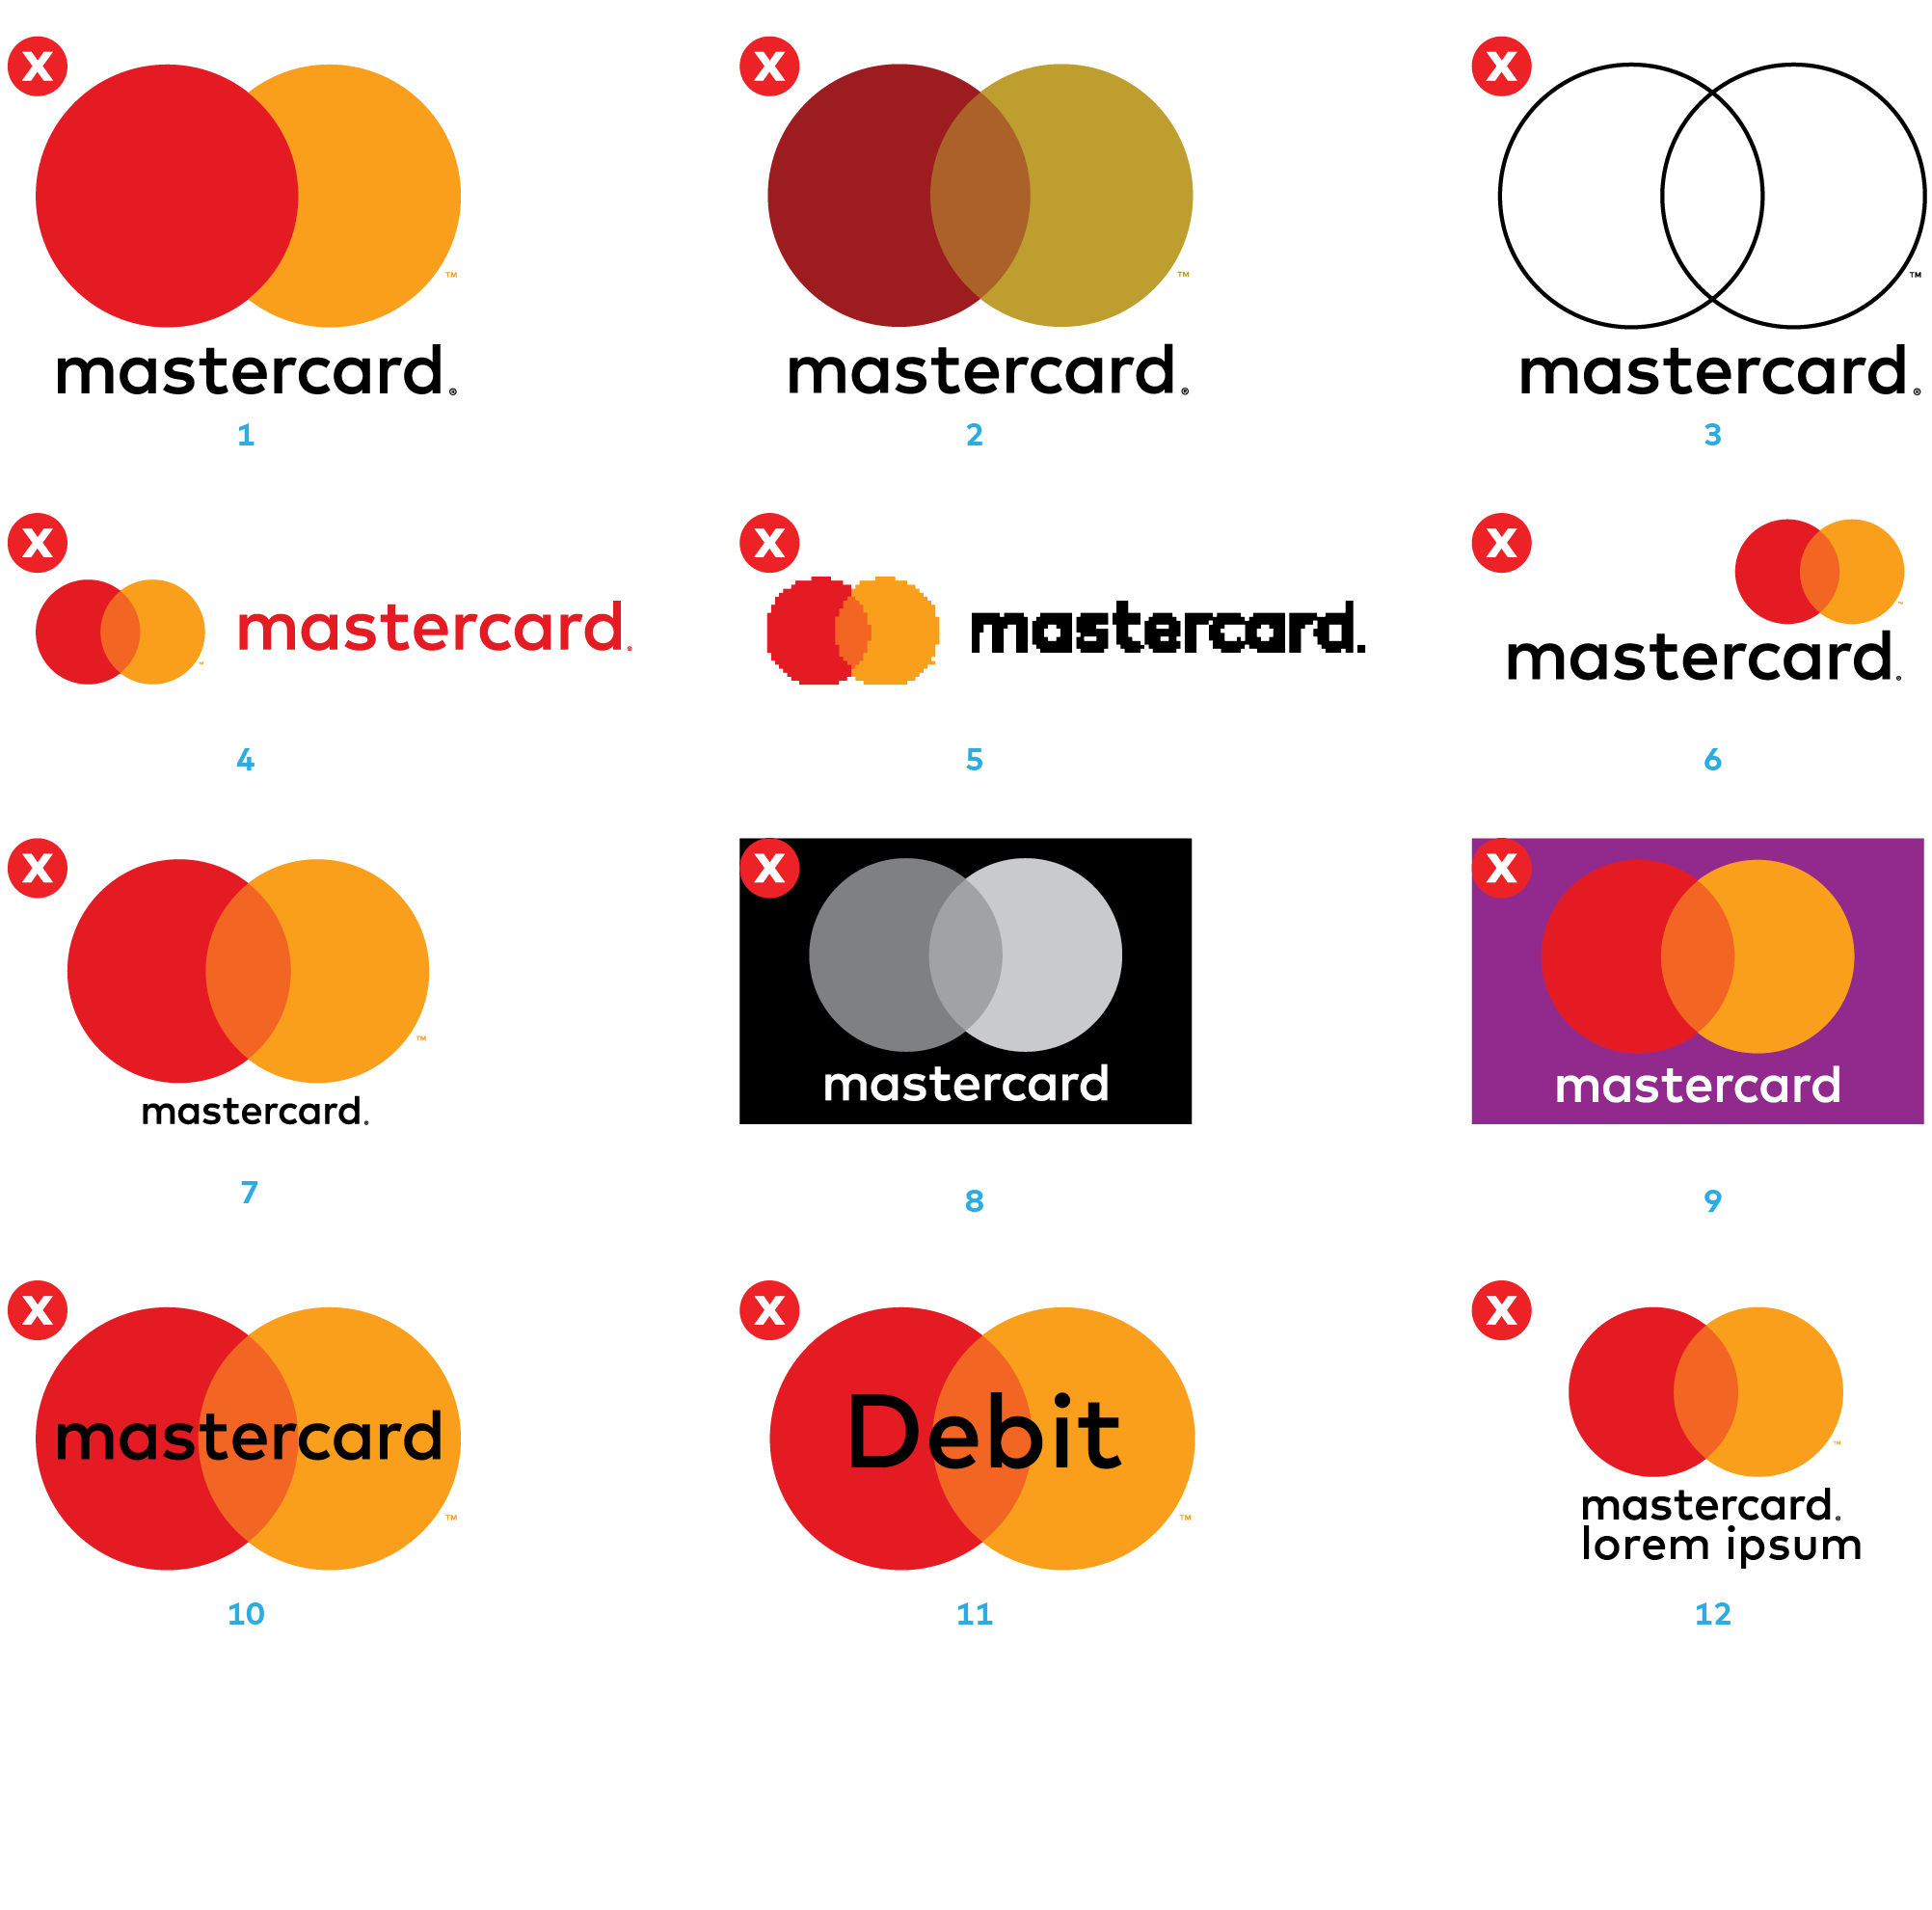 Debit Mastercard Guidelines & Logo Usage Rules